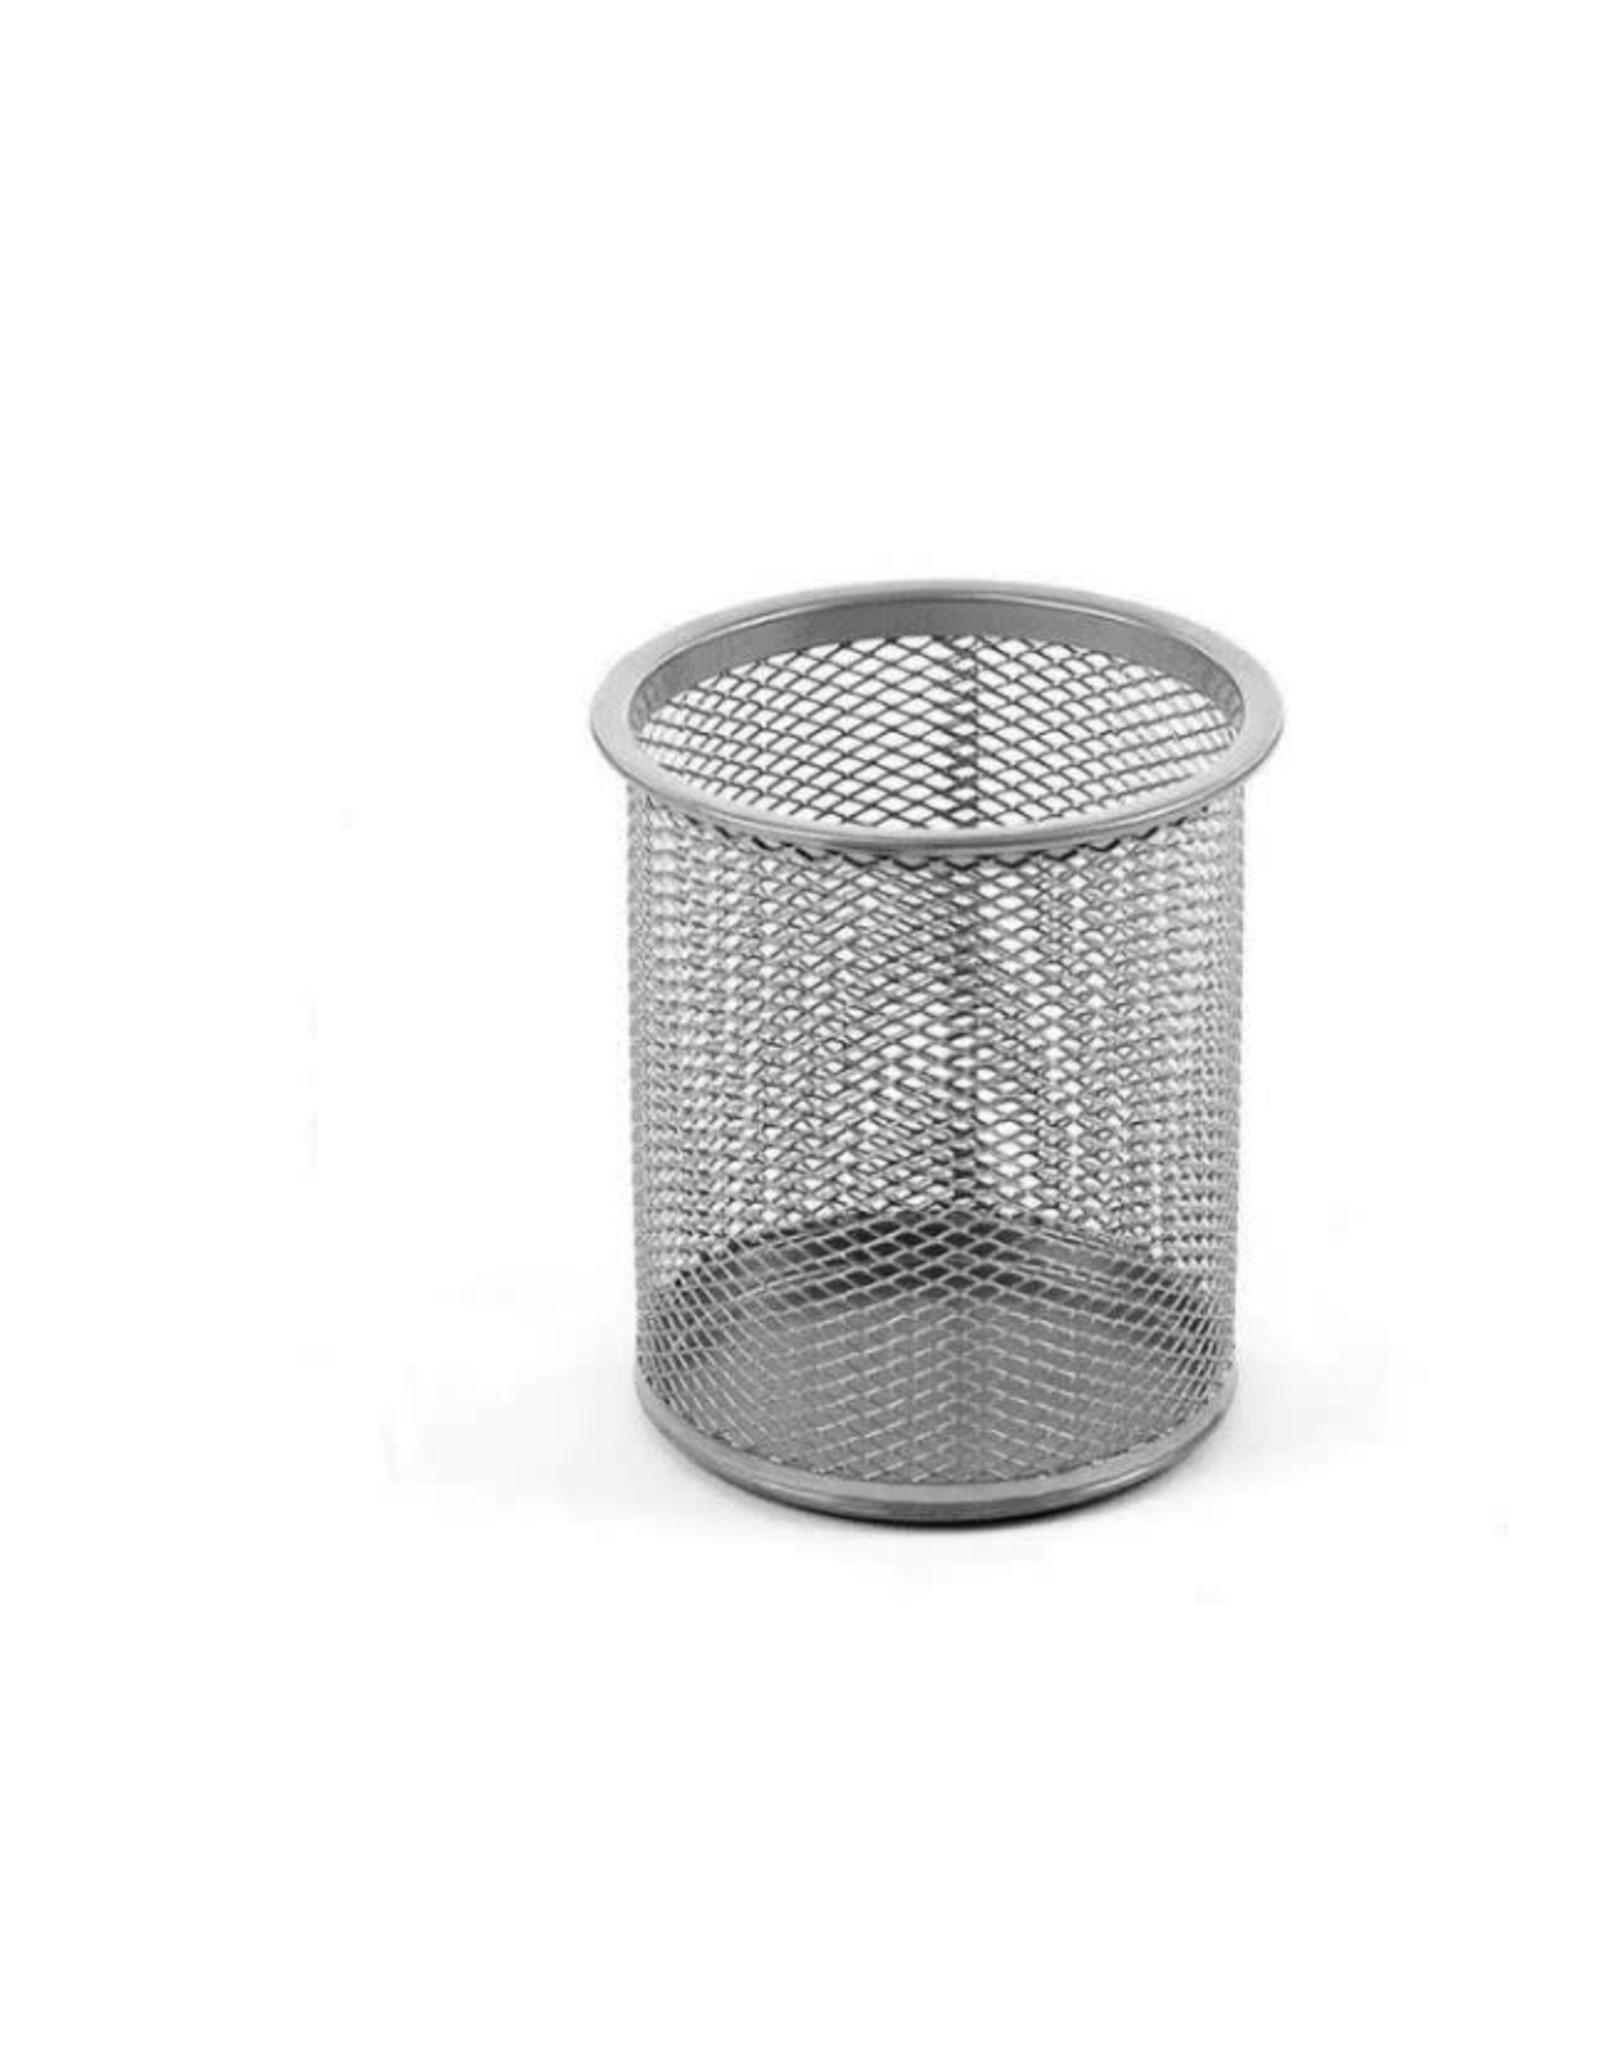 Office Round Desk Steel Mesh Pencil Cup Pen Holder Silver 2210